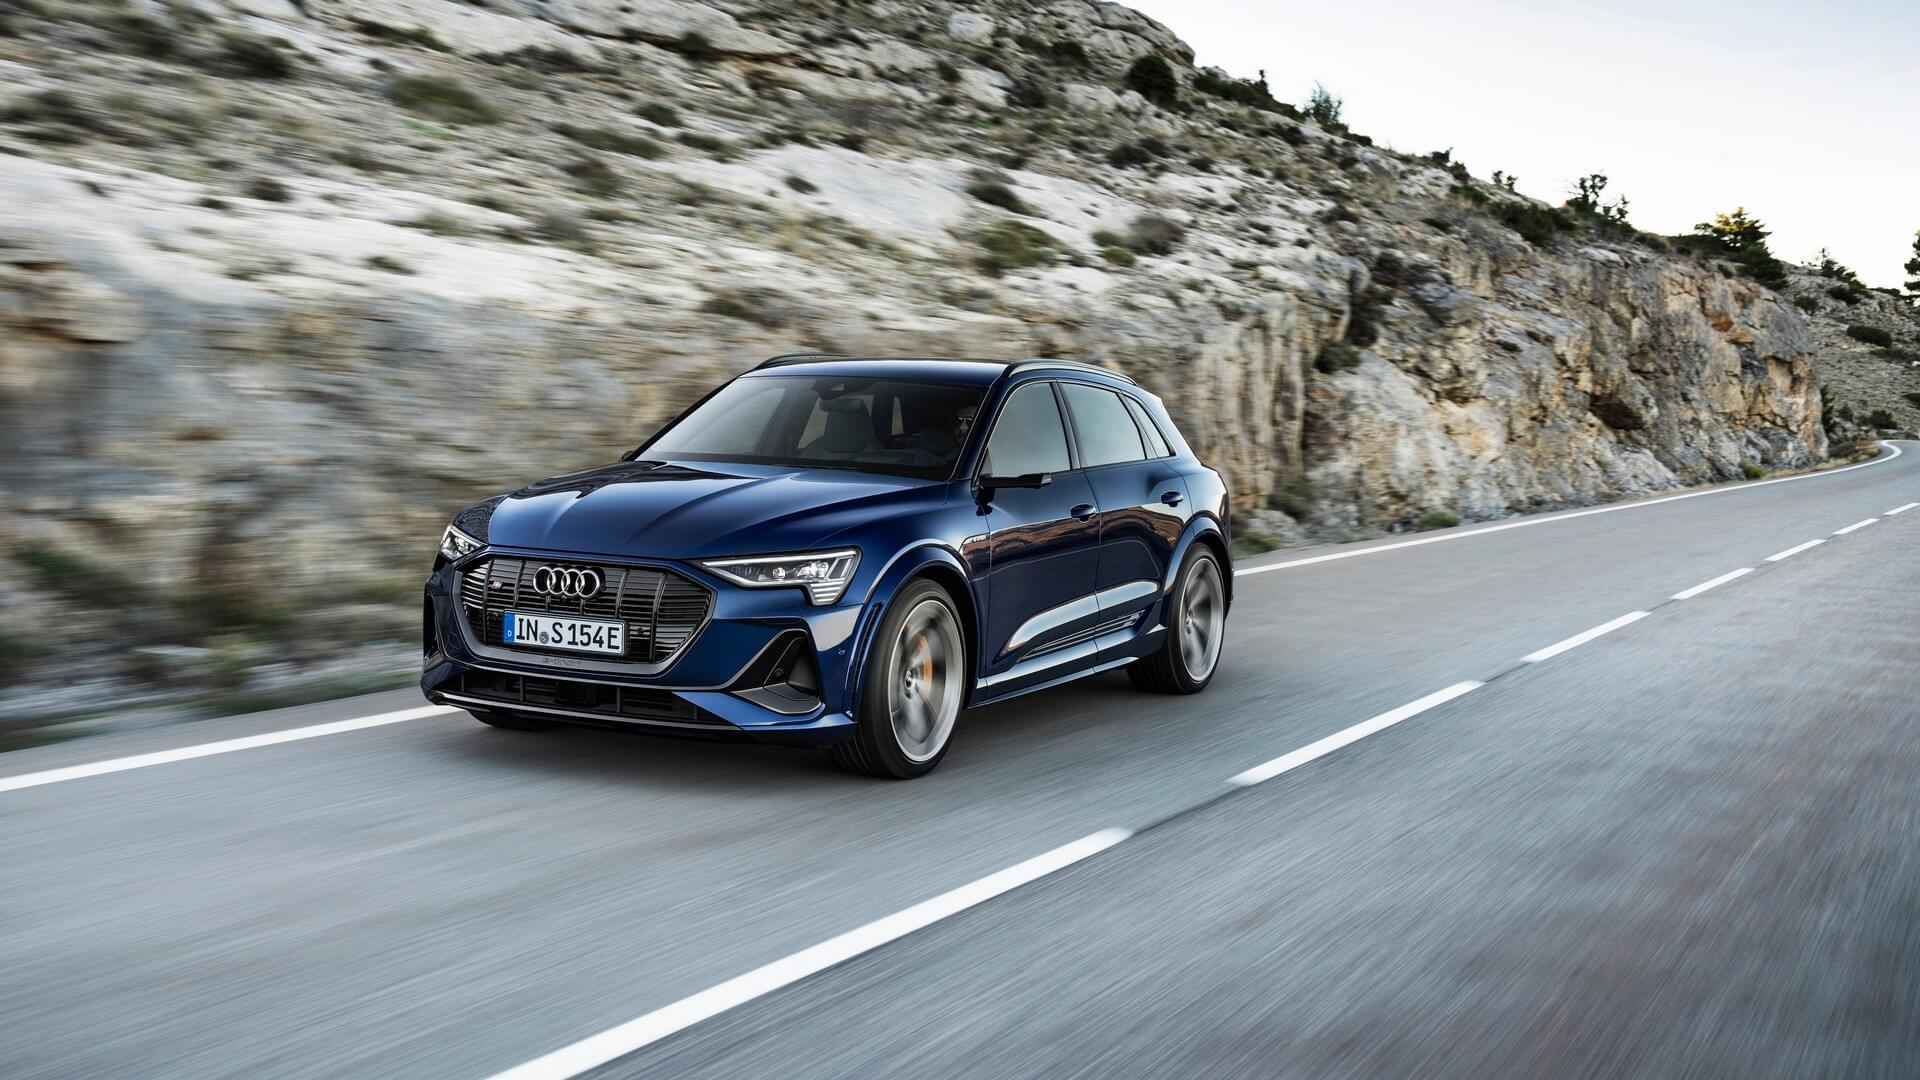 Audi-E-Tron-S-and-E-Tron-S-Sportback-2020-12